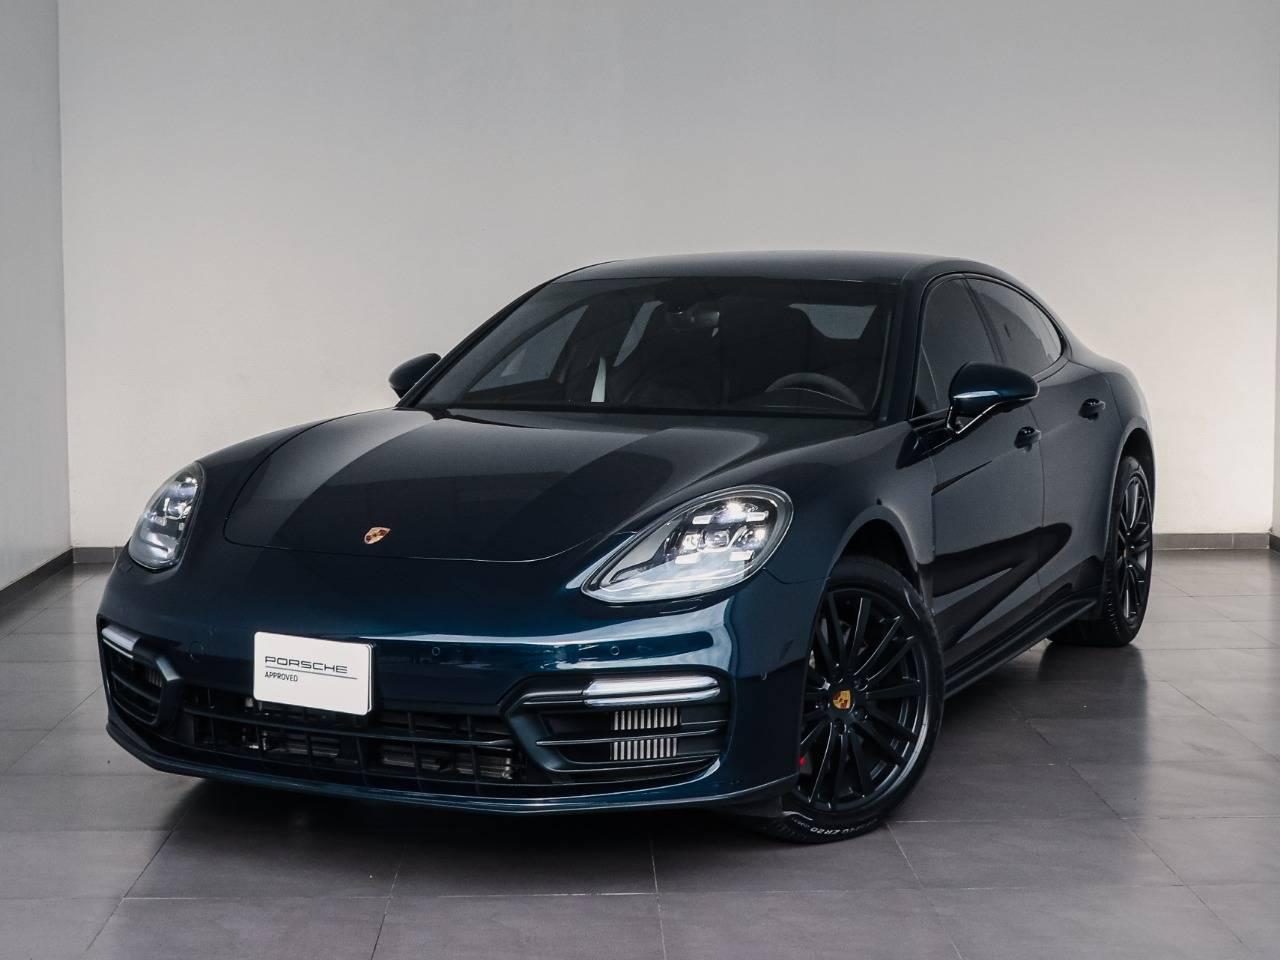 2019 Porsche Panamera GTS – 1